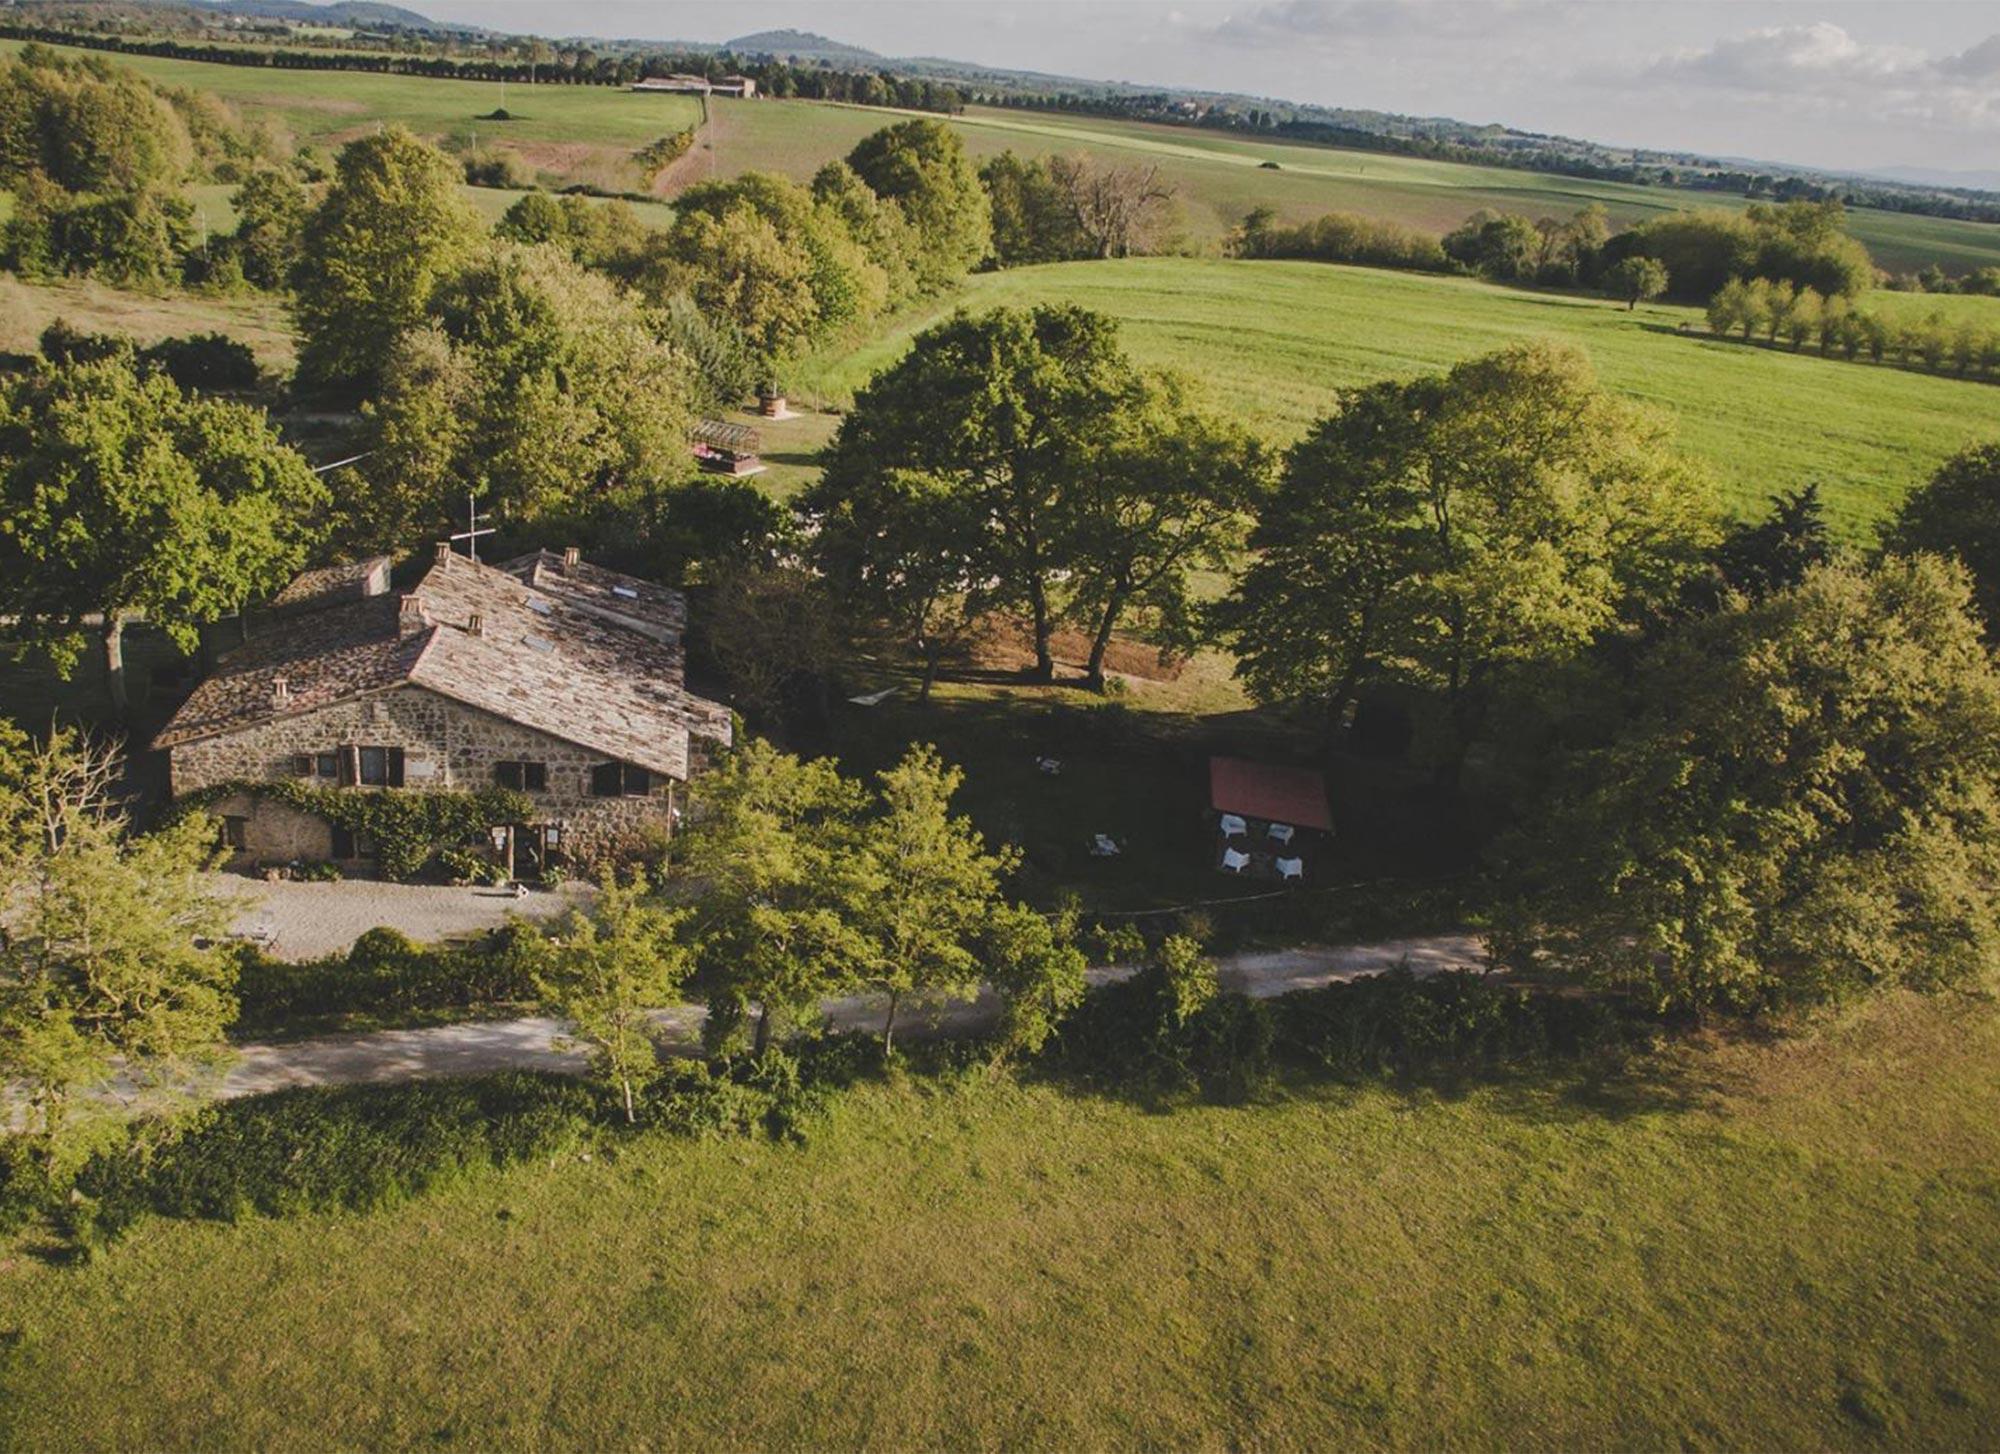 Das Agriturismo Biologico Sant'Egle in der Toskana